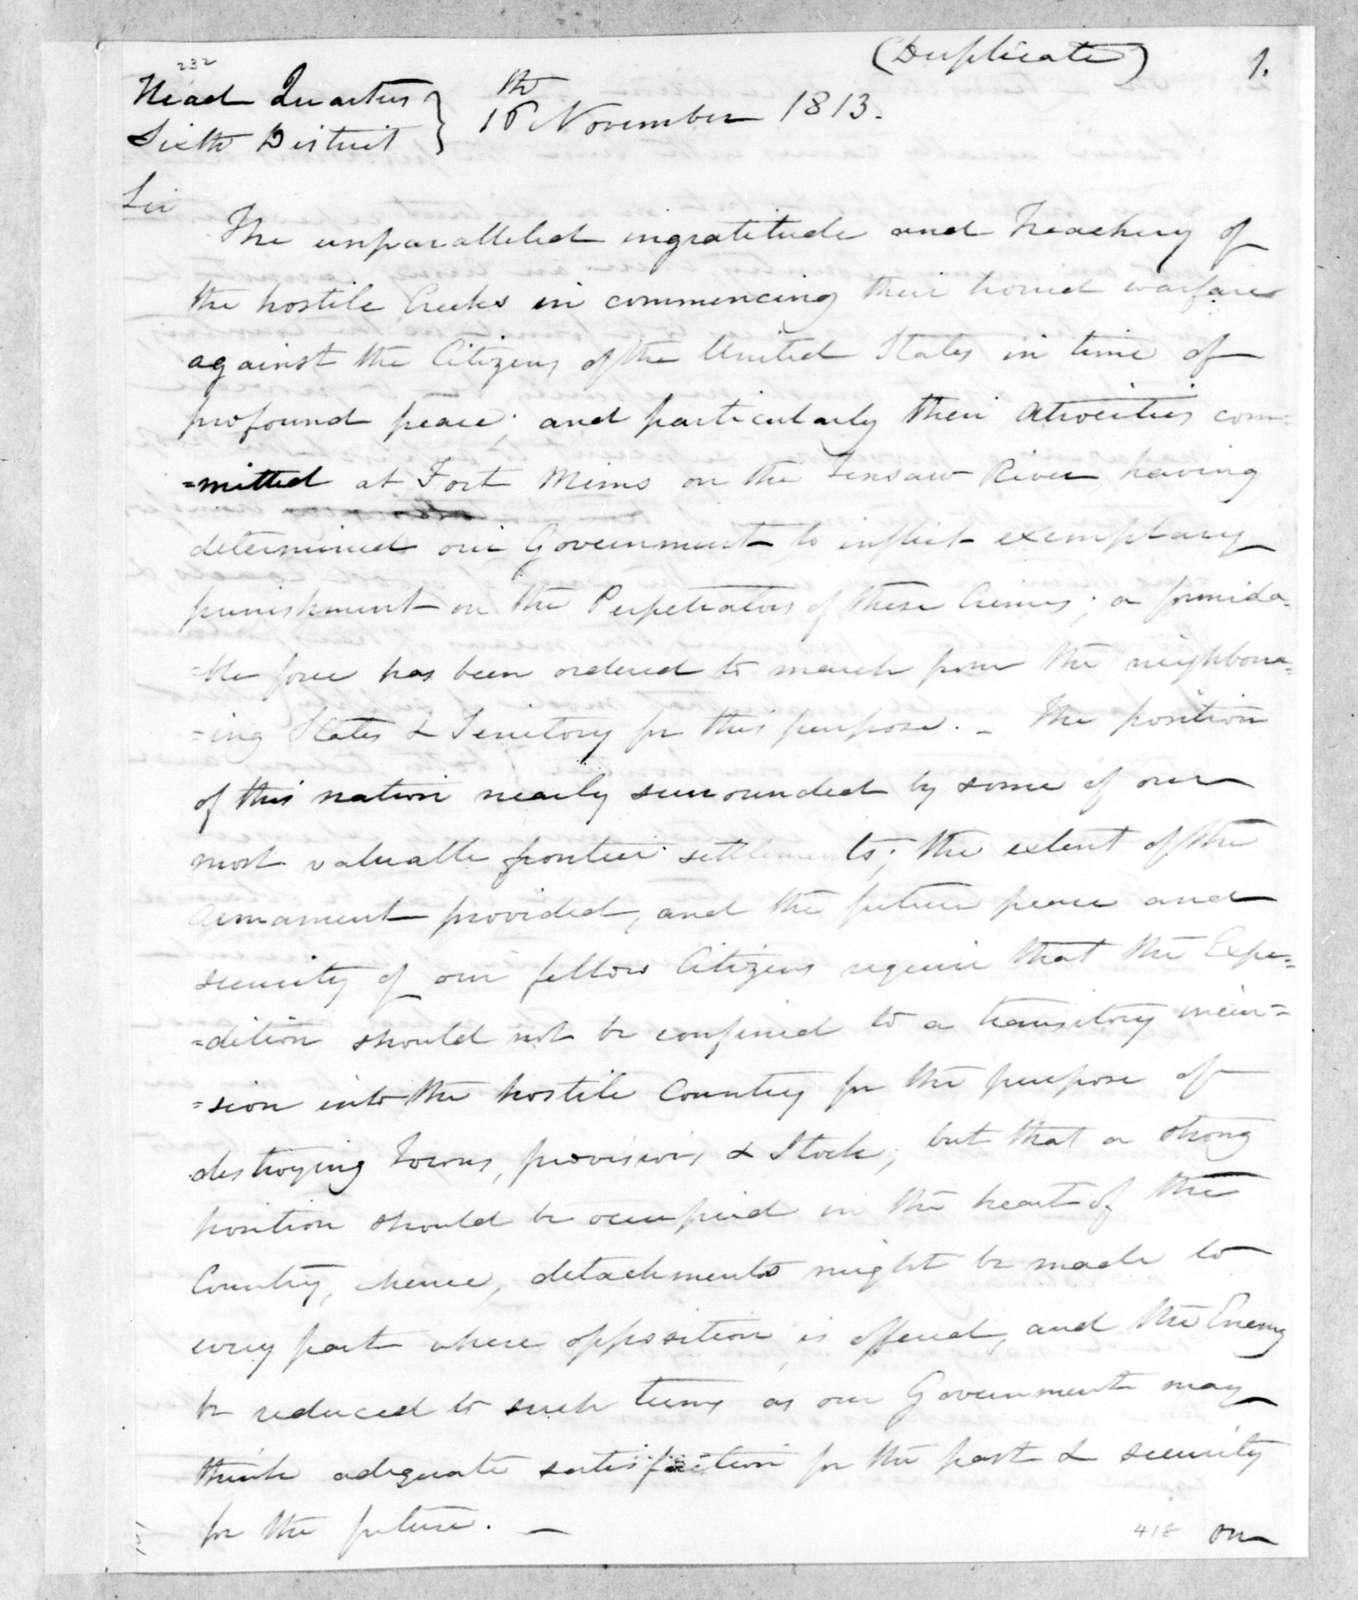 Thomas Pinckney to Andrew Jackson, November 16, 1813